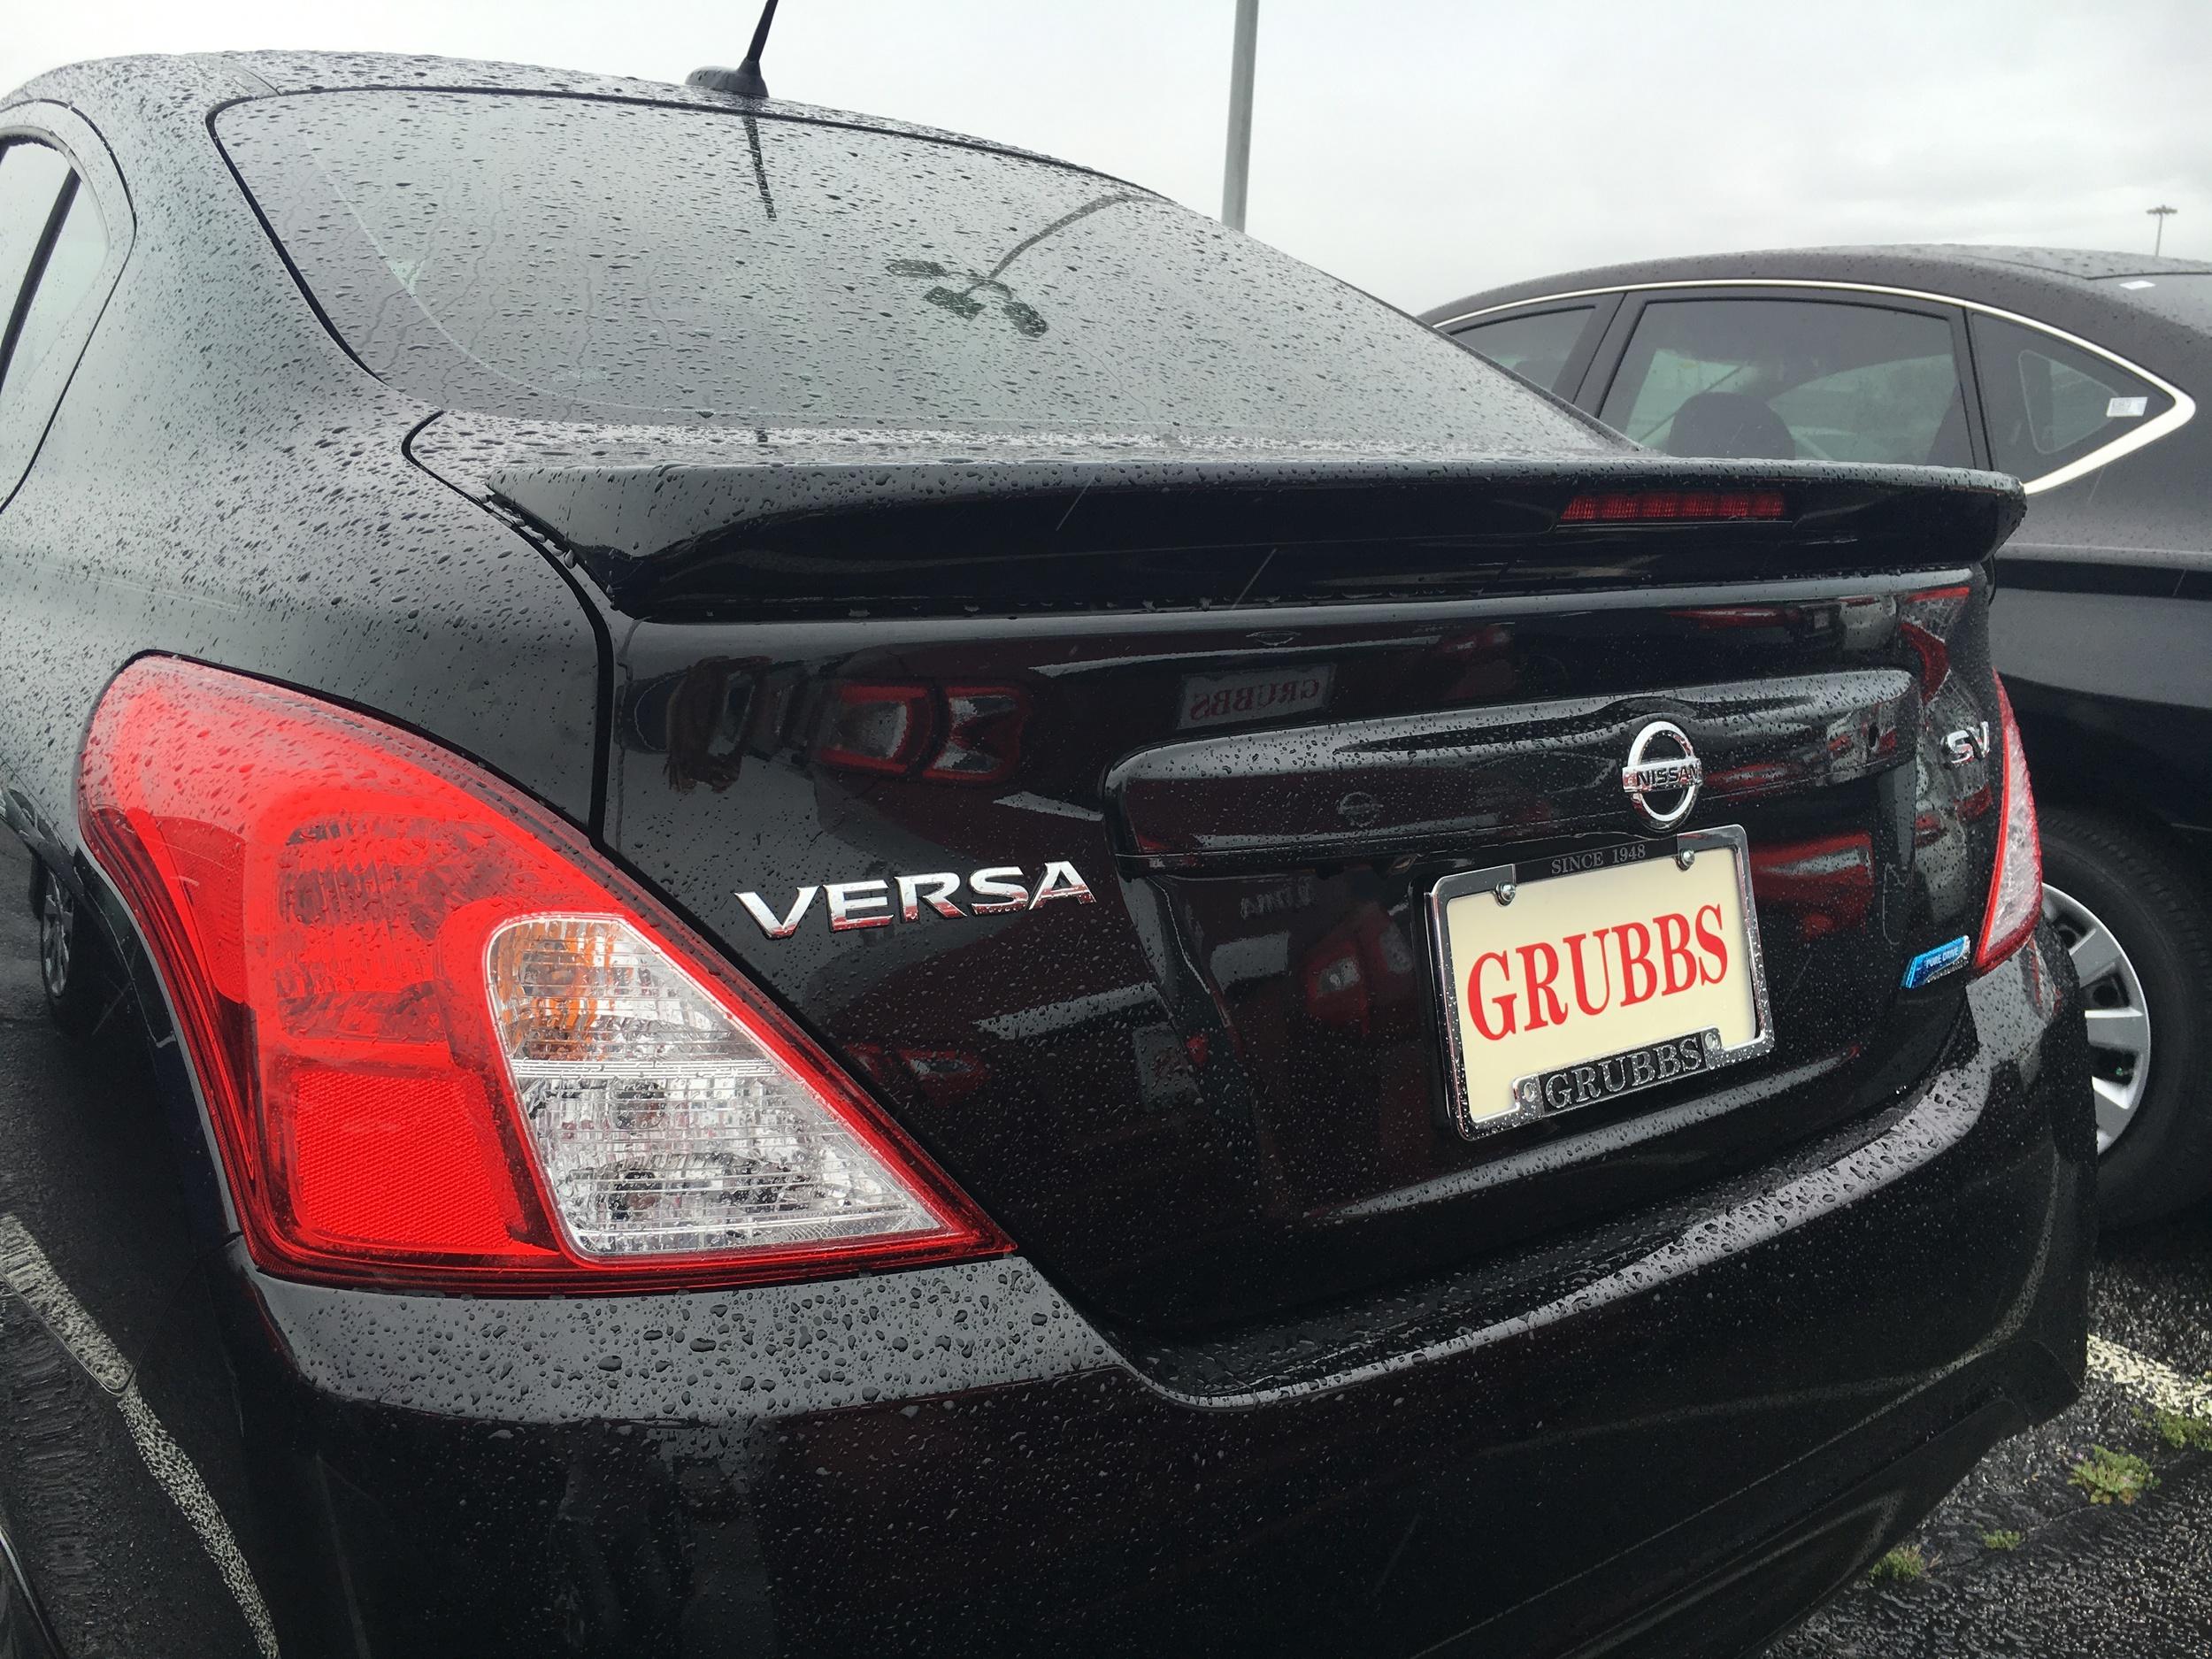 2012+ Nissan Versa Sedan Factory Style Flush Mount Spoiler